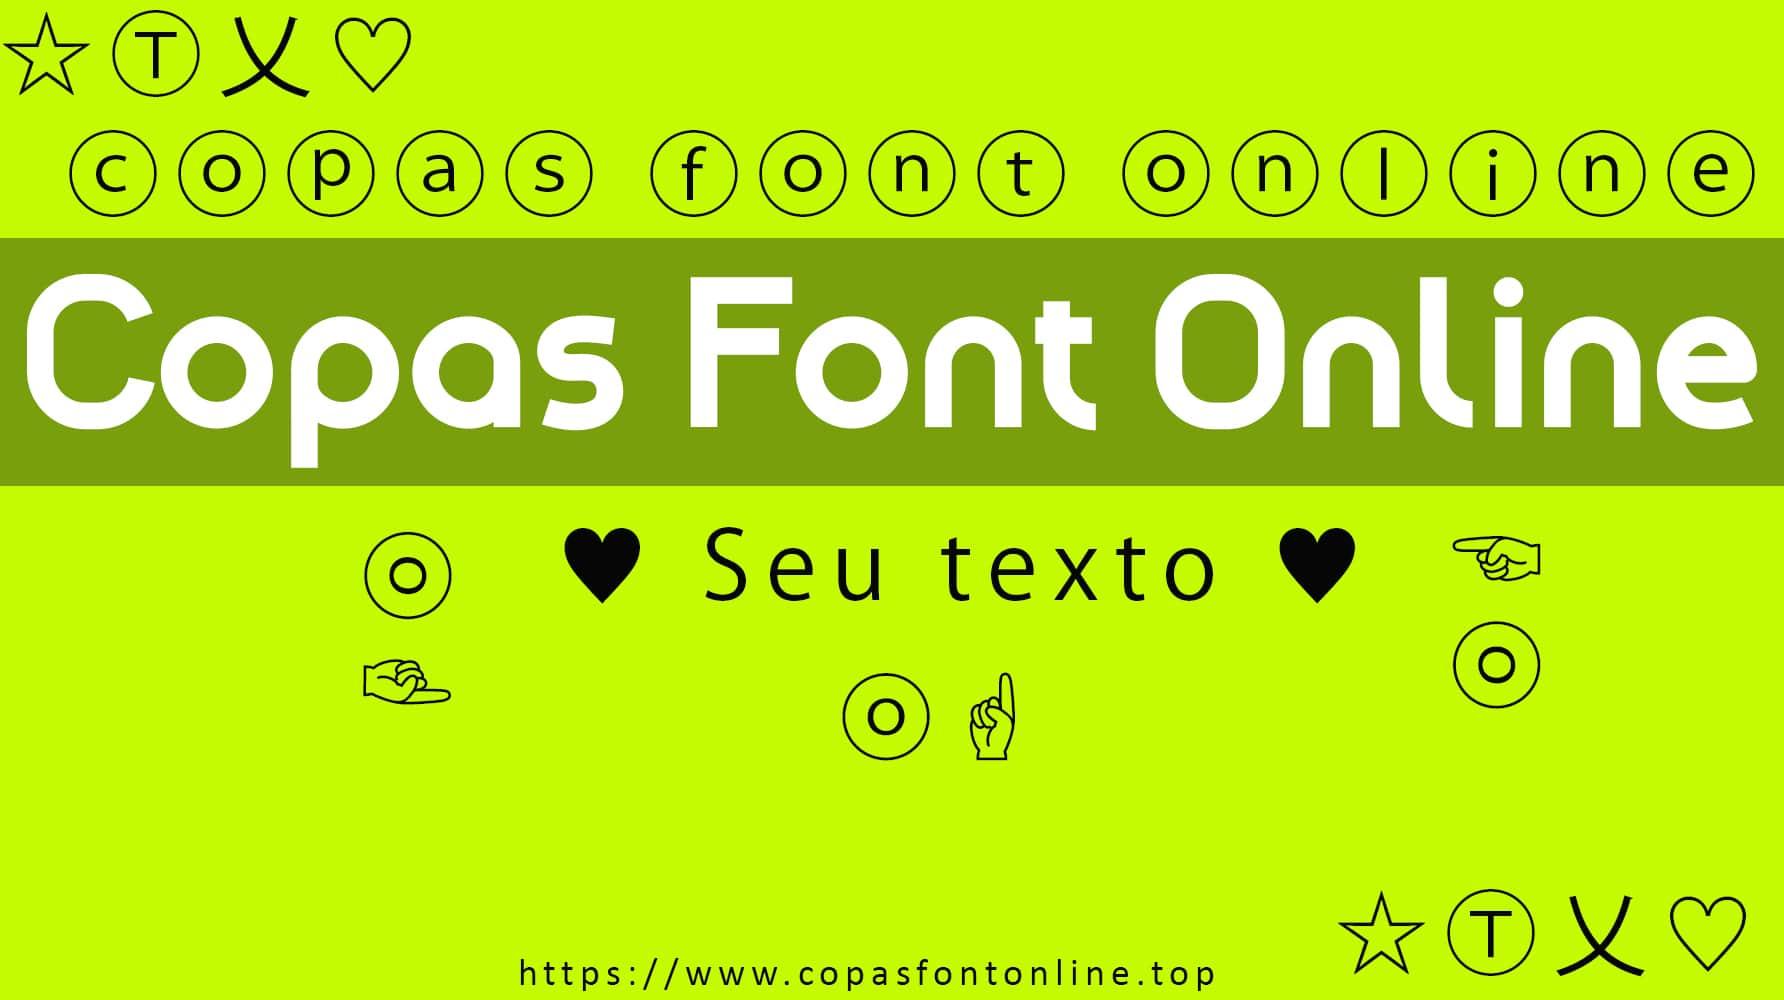 Copas Font Online,Font Keren